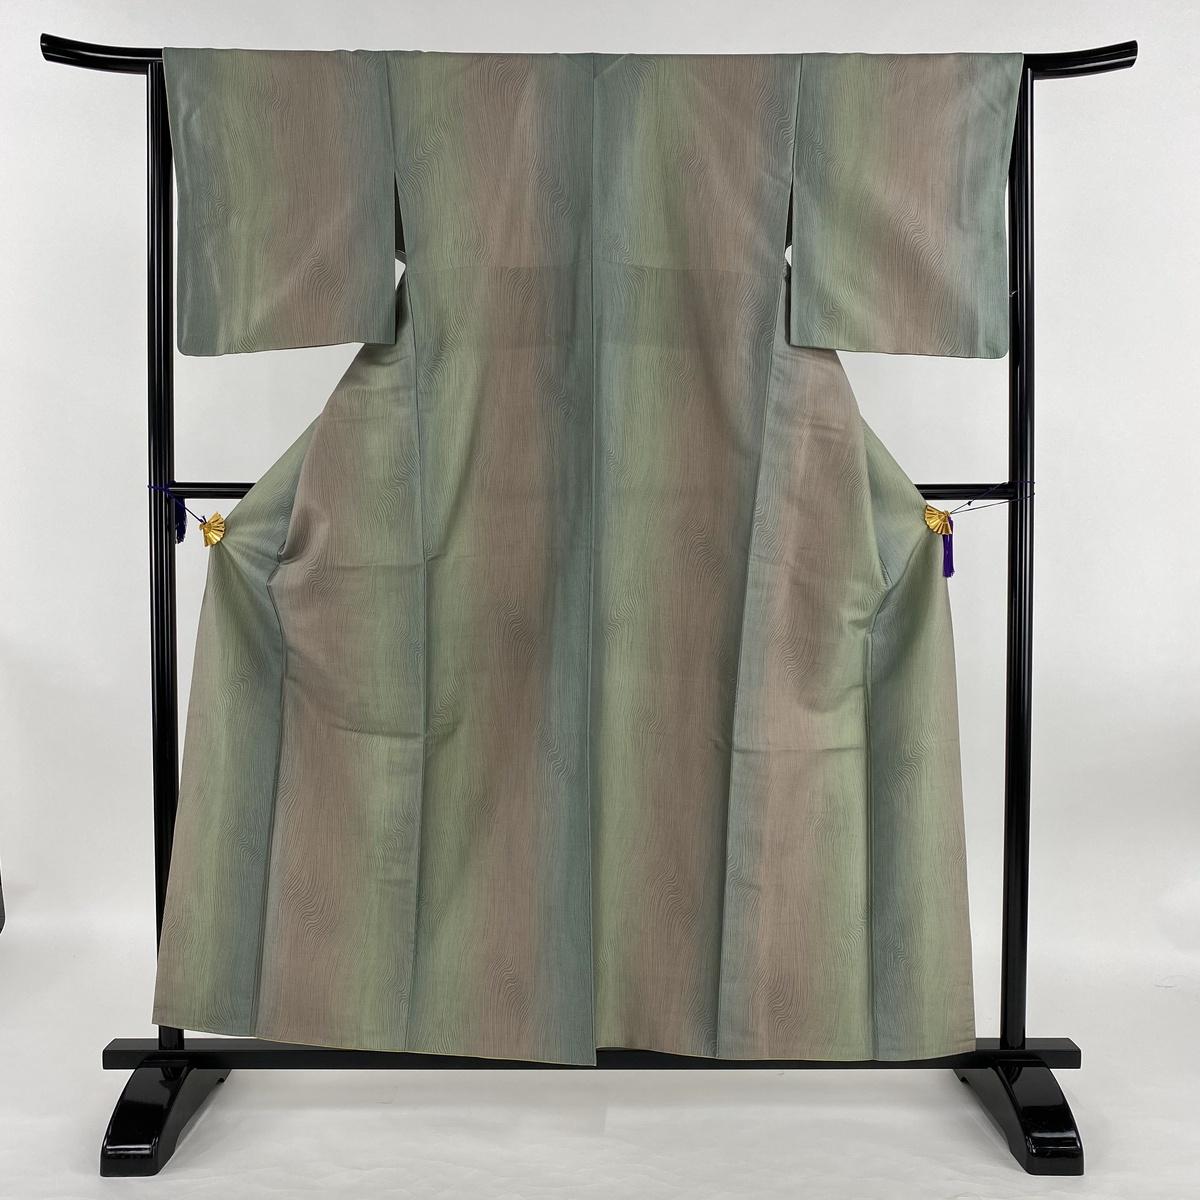 小紋 美品 名品 紬地 幾何学 木目風 縦ぼかし 薄緑 袷 身丈157.5cm 裄丈65cm M 正絹 【中古】